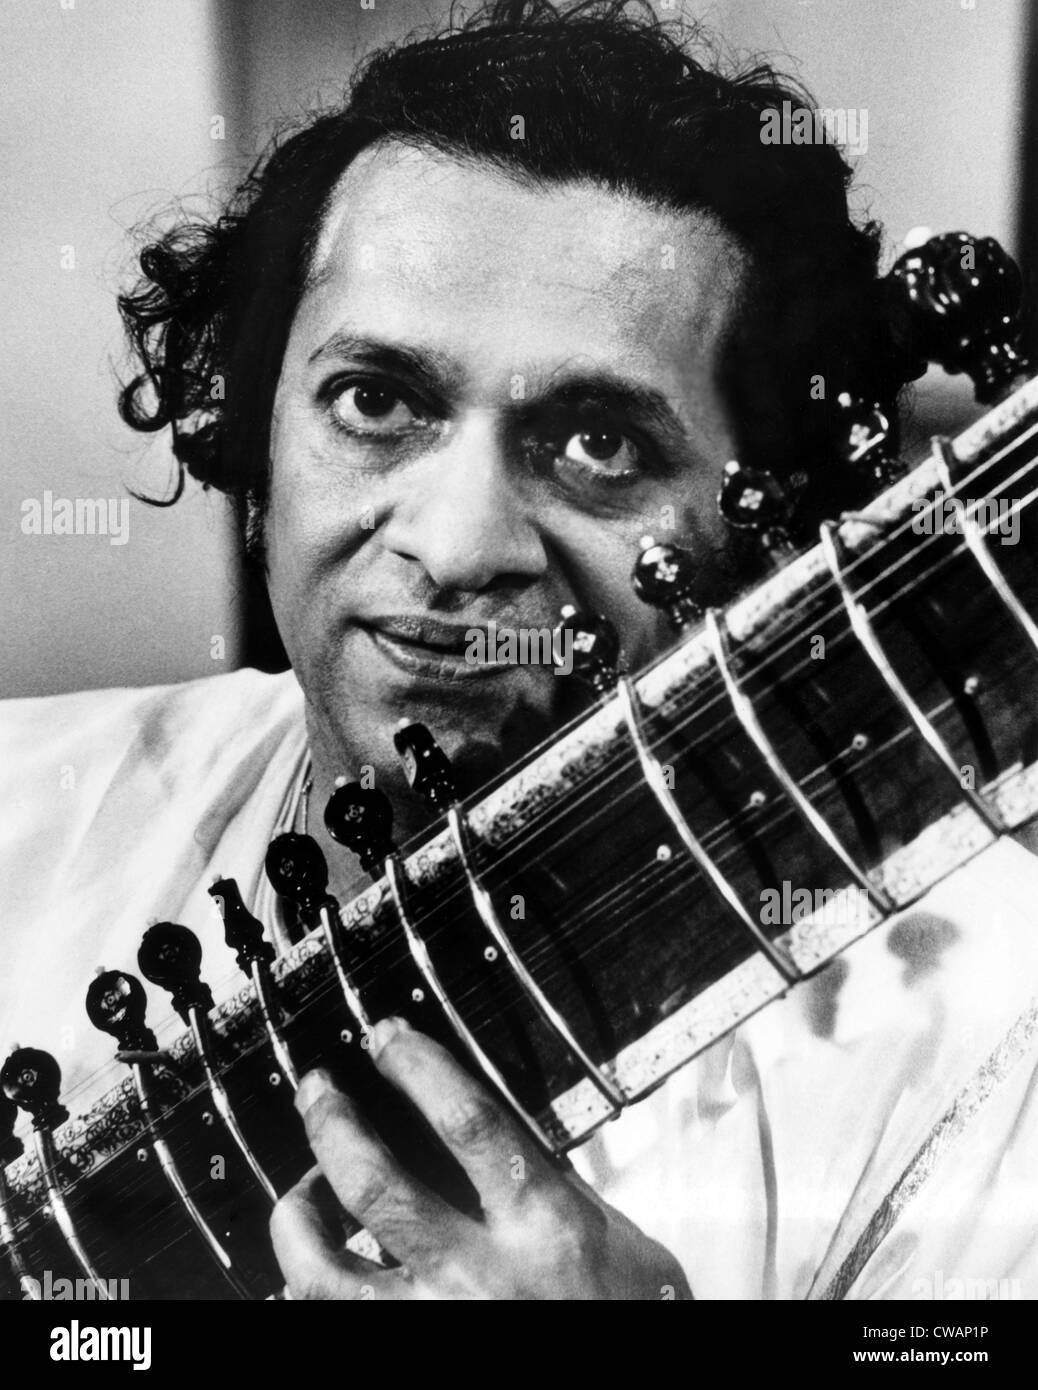 Ravi Shankar, musician, composer, performer and scholar, portrait, 1960s. Courtesy: CSU Archives / Everett Collection Stock Foto